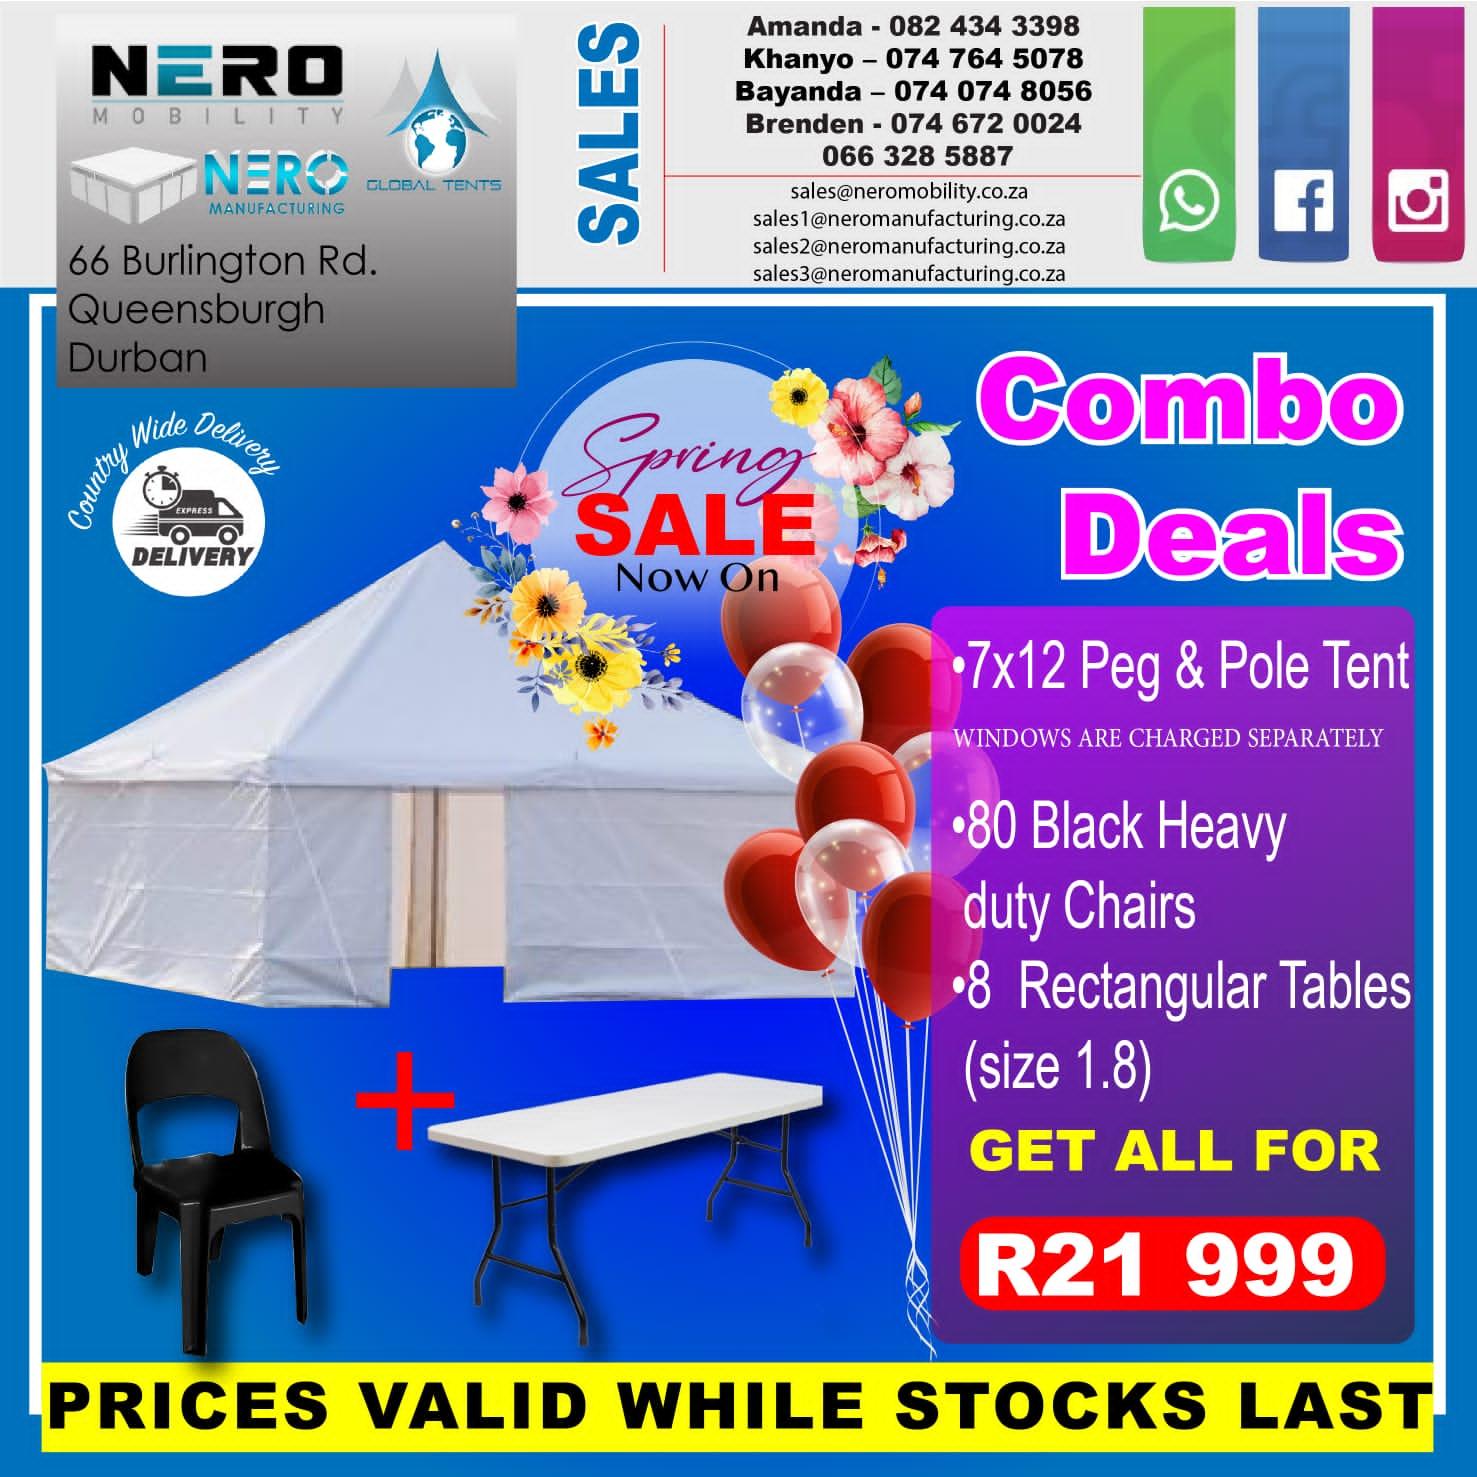 7x12 peg & pole tent combo deal